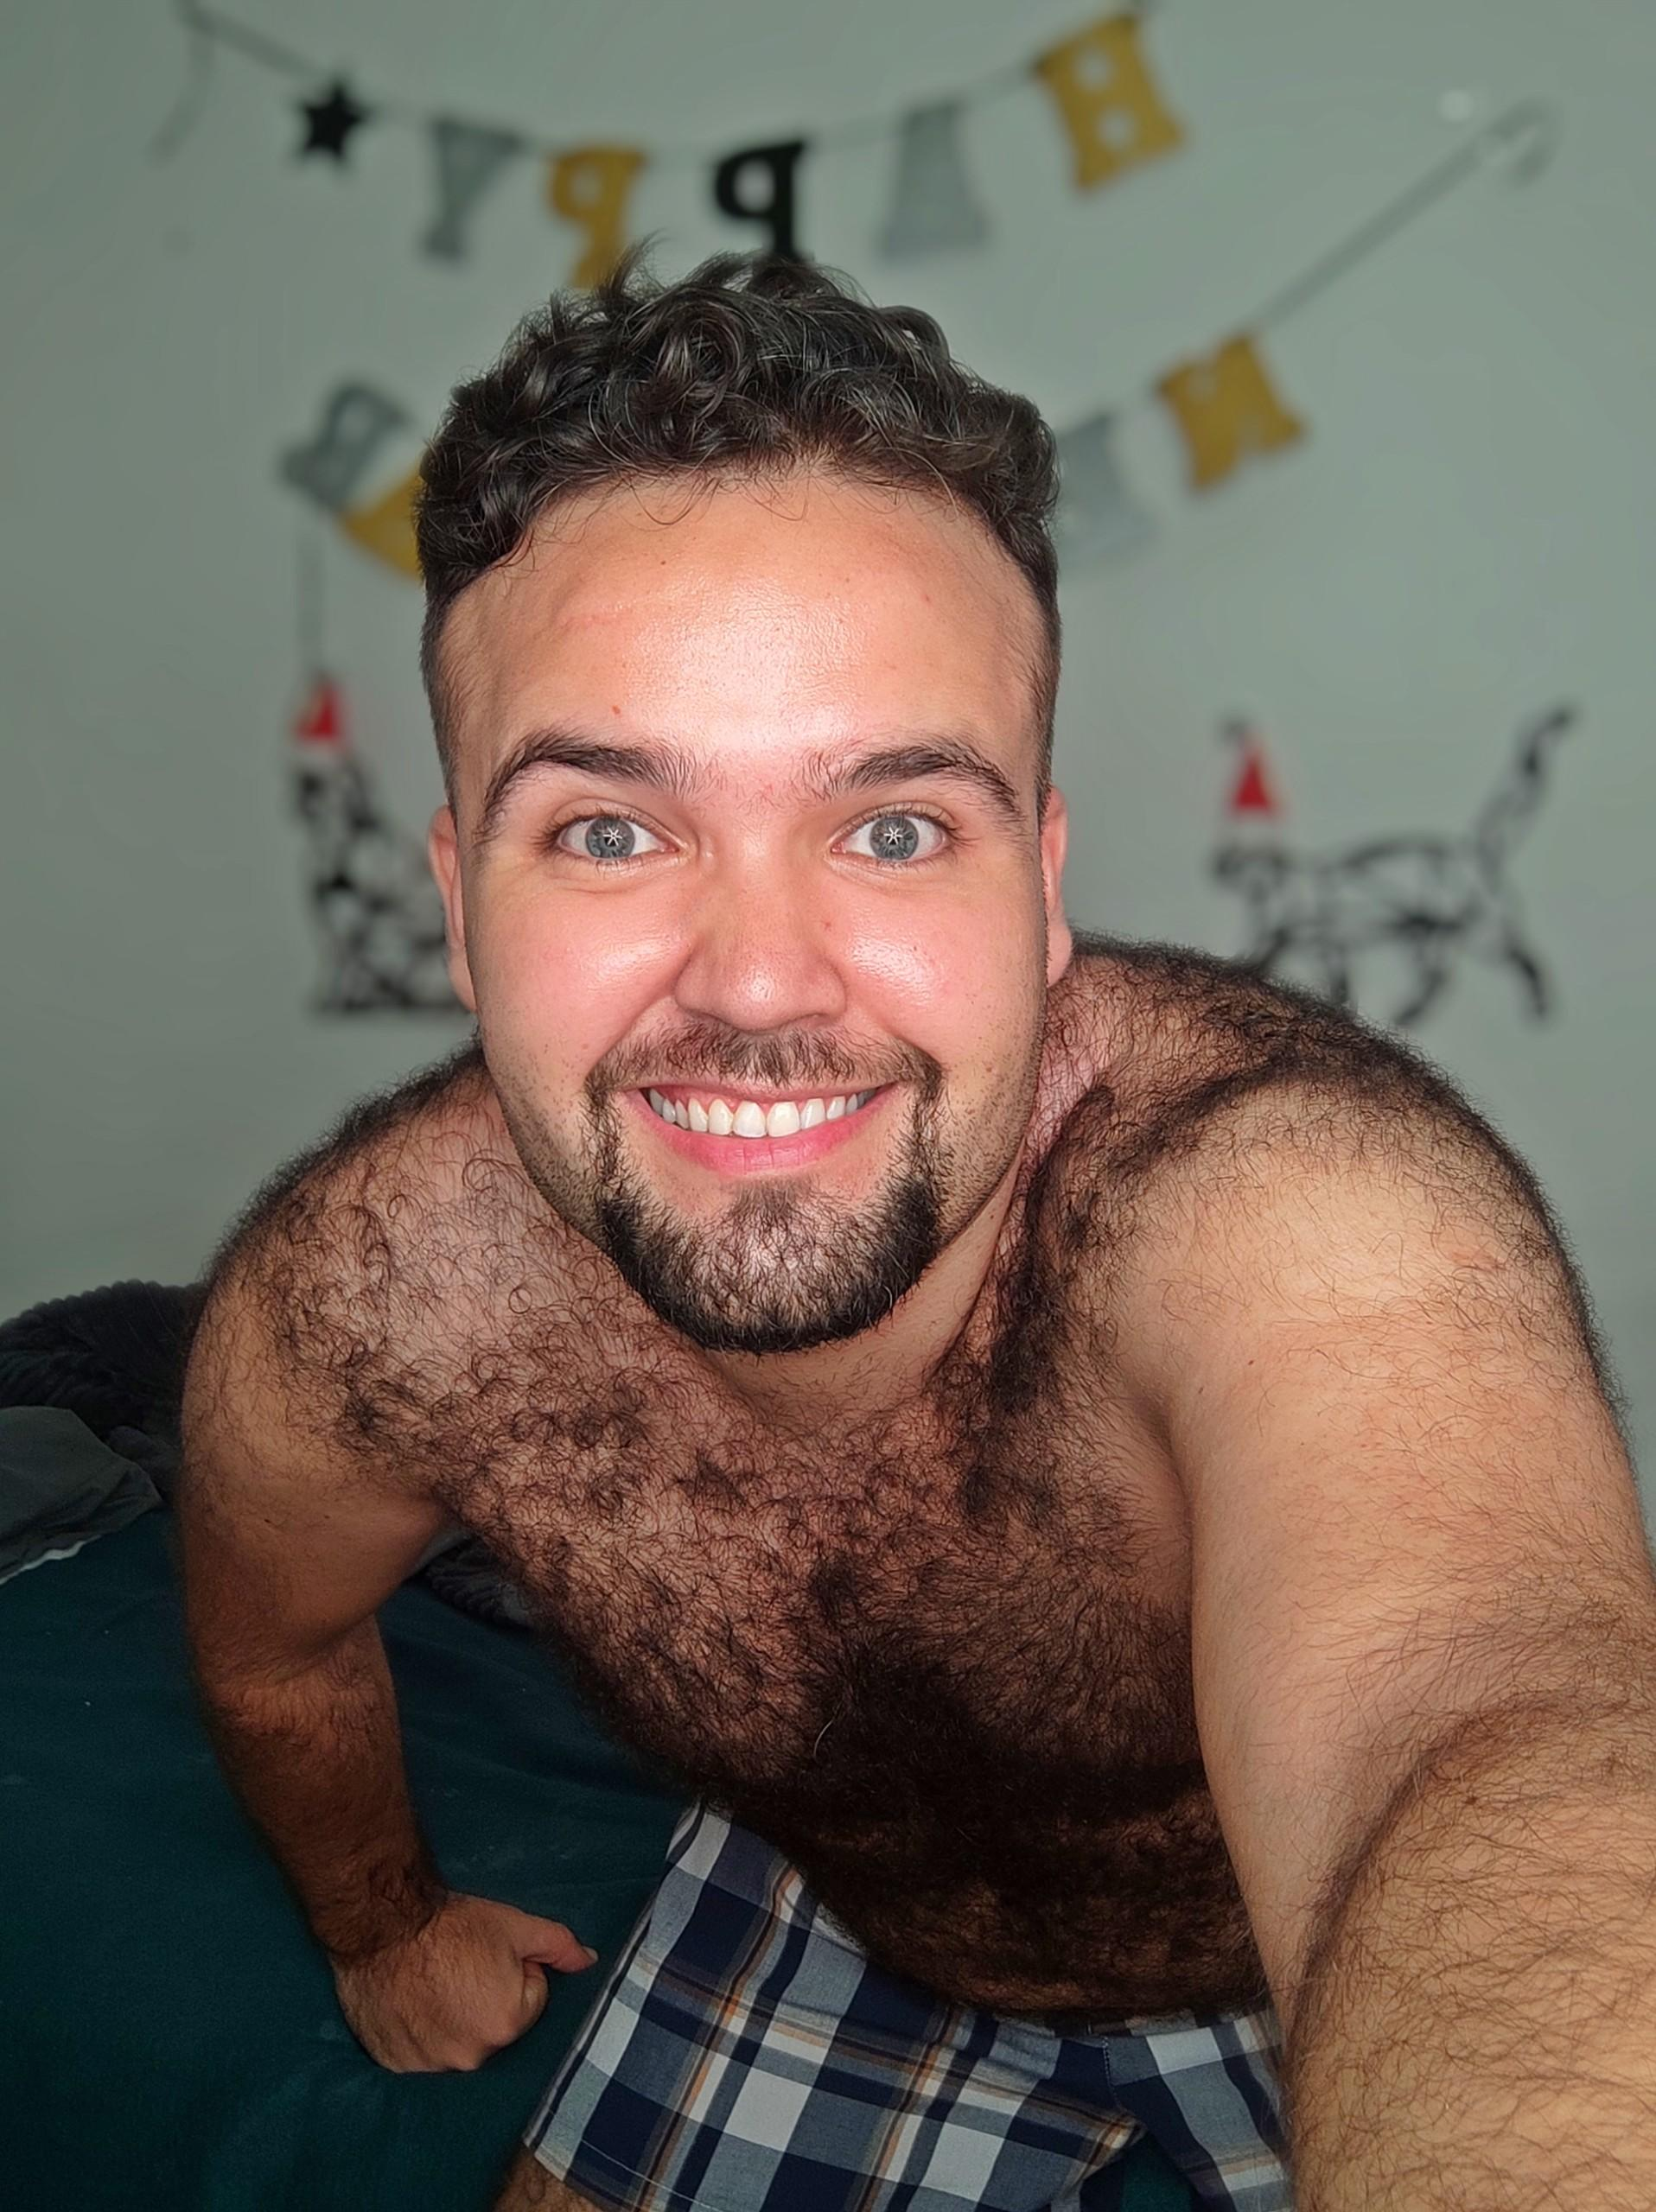 Werewolfm?s=soovdcx0wcsvmzv9inzjyvq8iijhwcq294ijmbknyya=